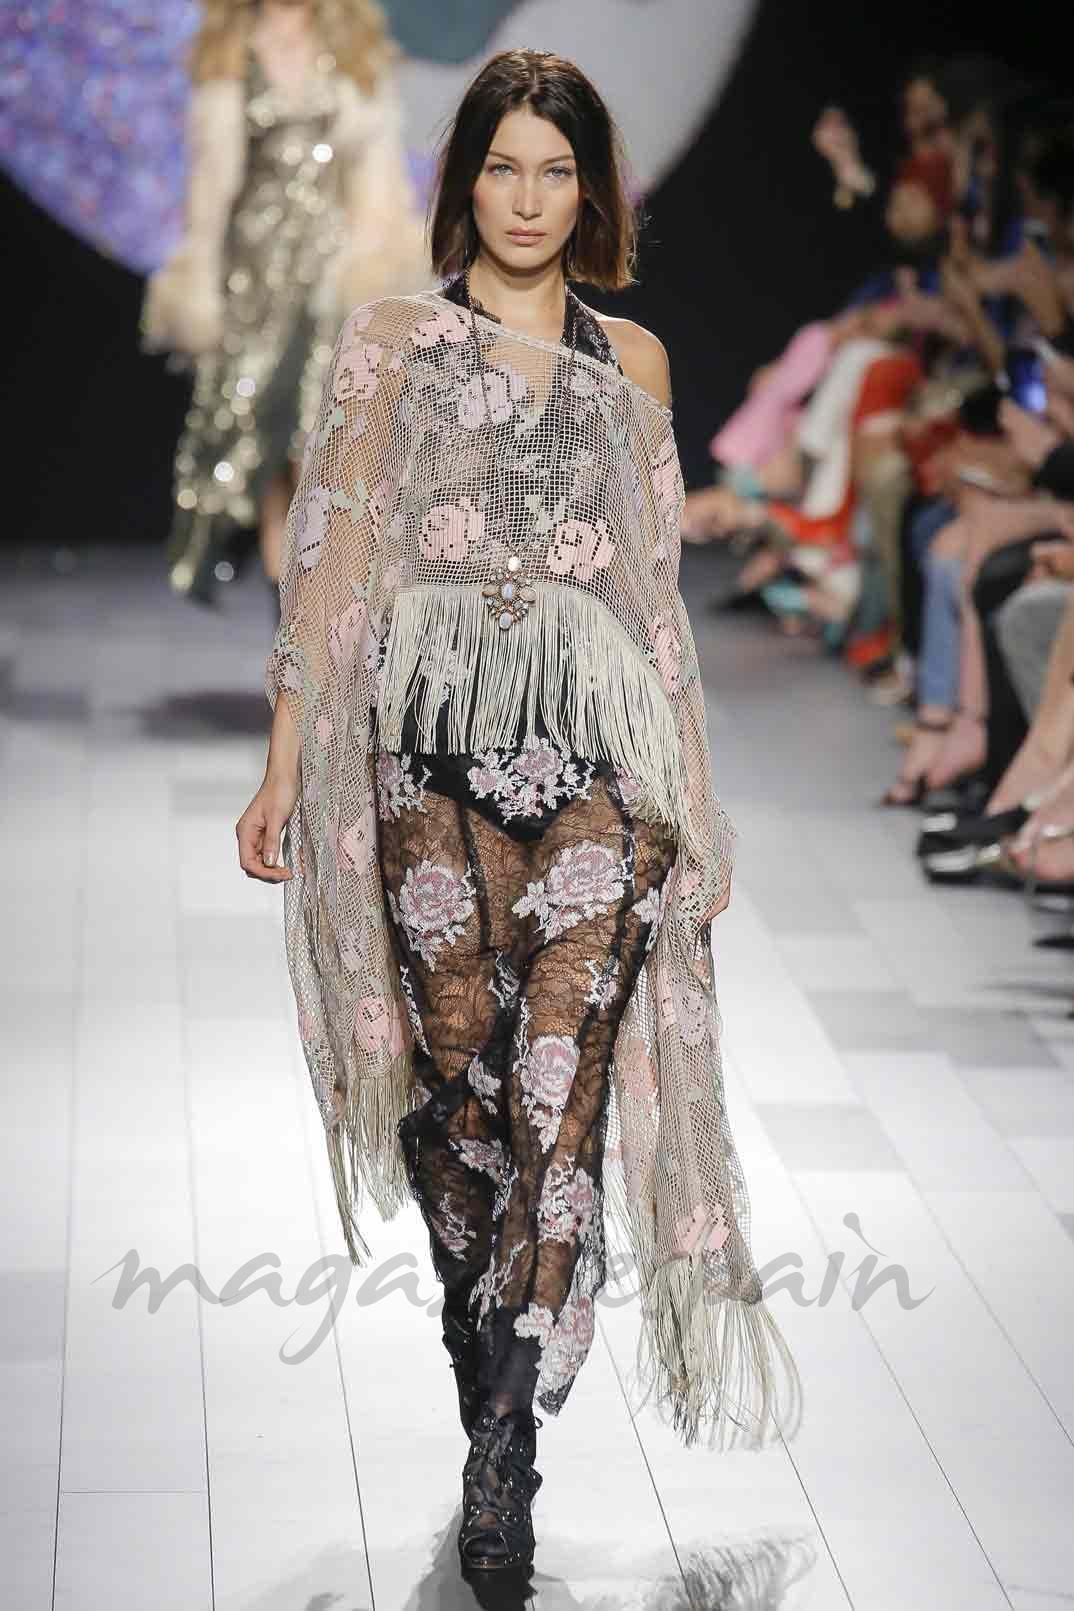 Bella Hadid - NYFW SS10 - Anna Sui